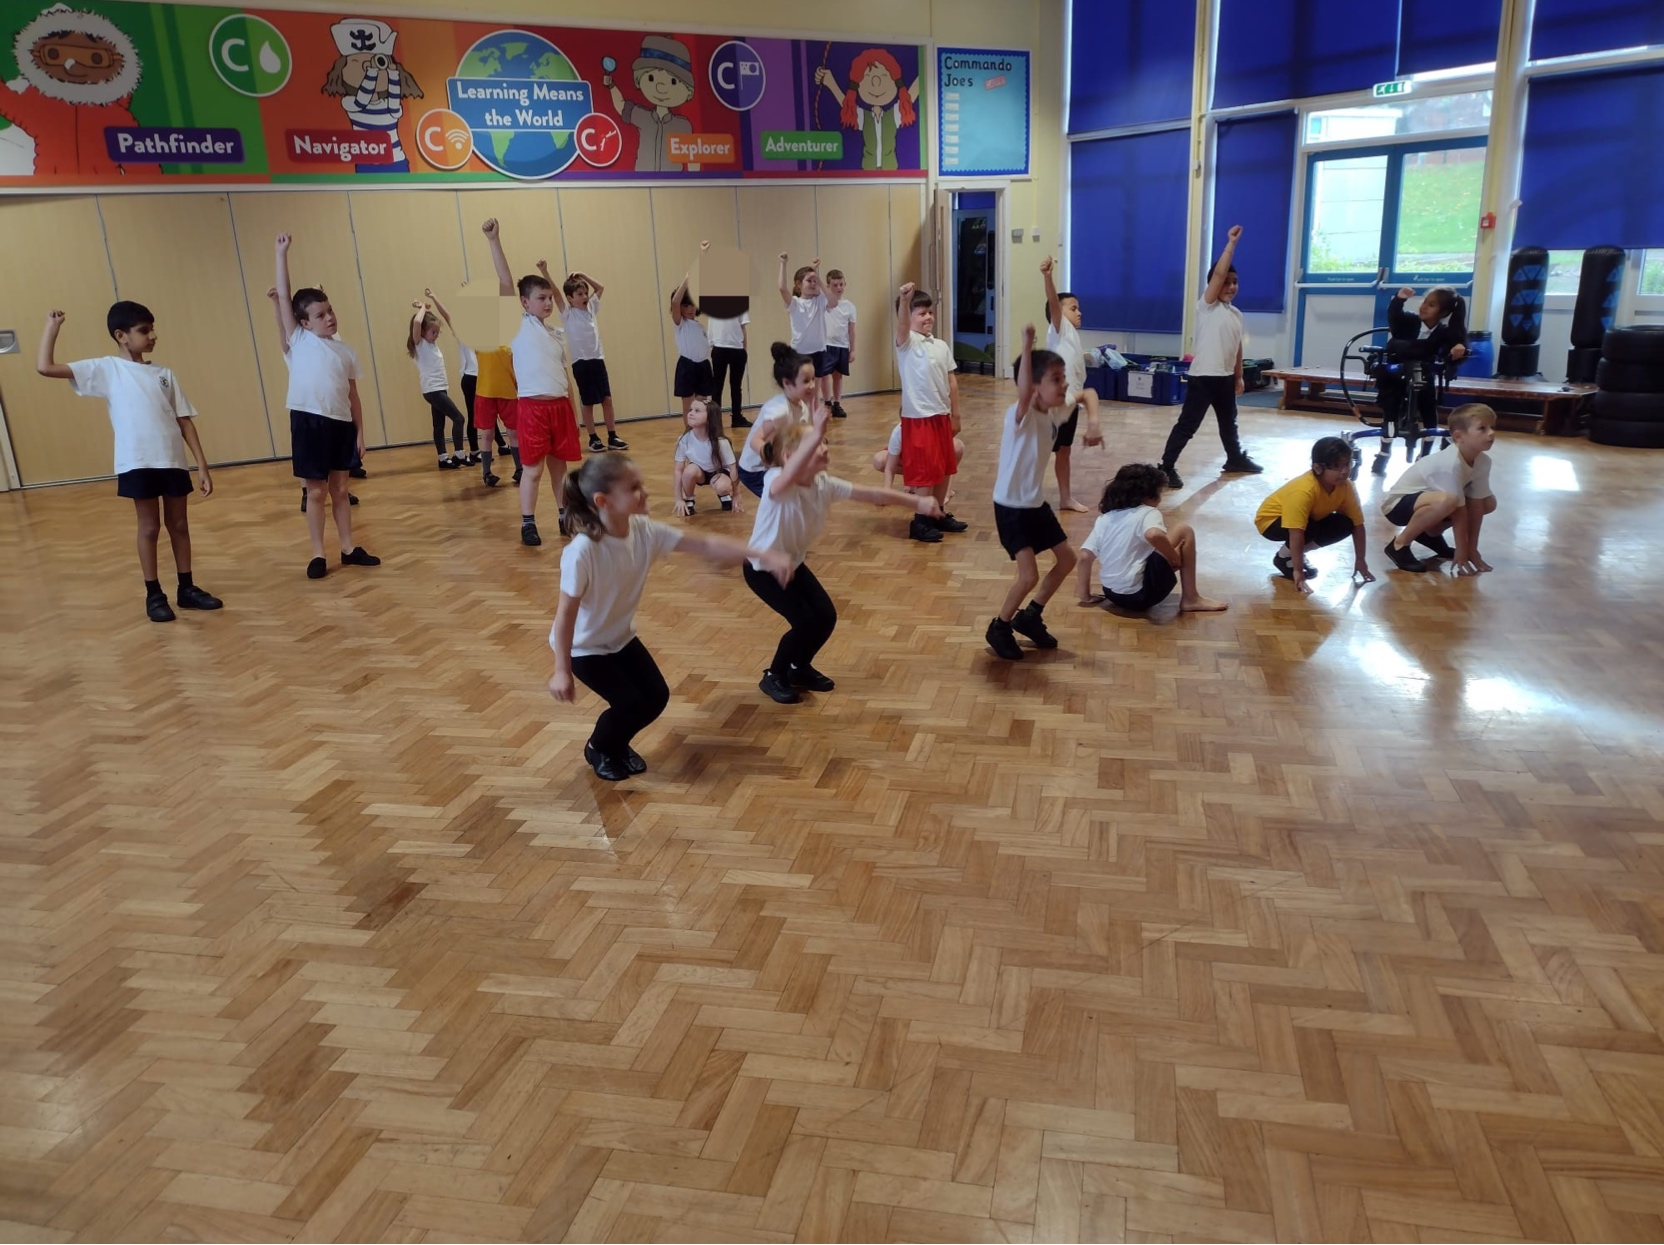 Year 3 children enjoying their dance lesson with Cheryl